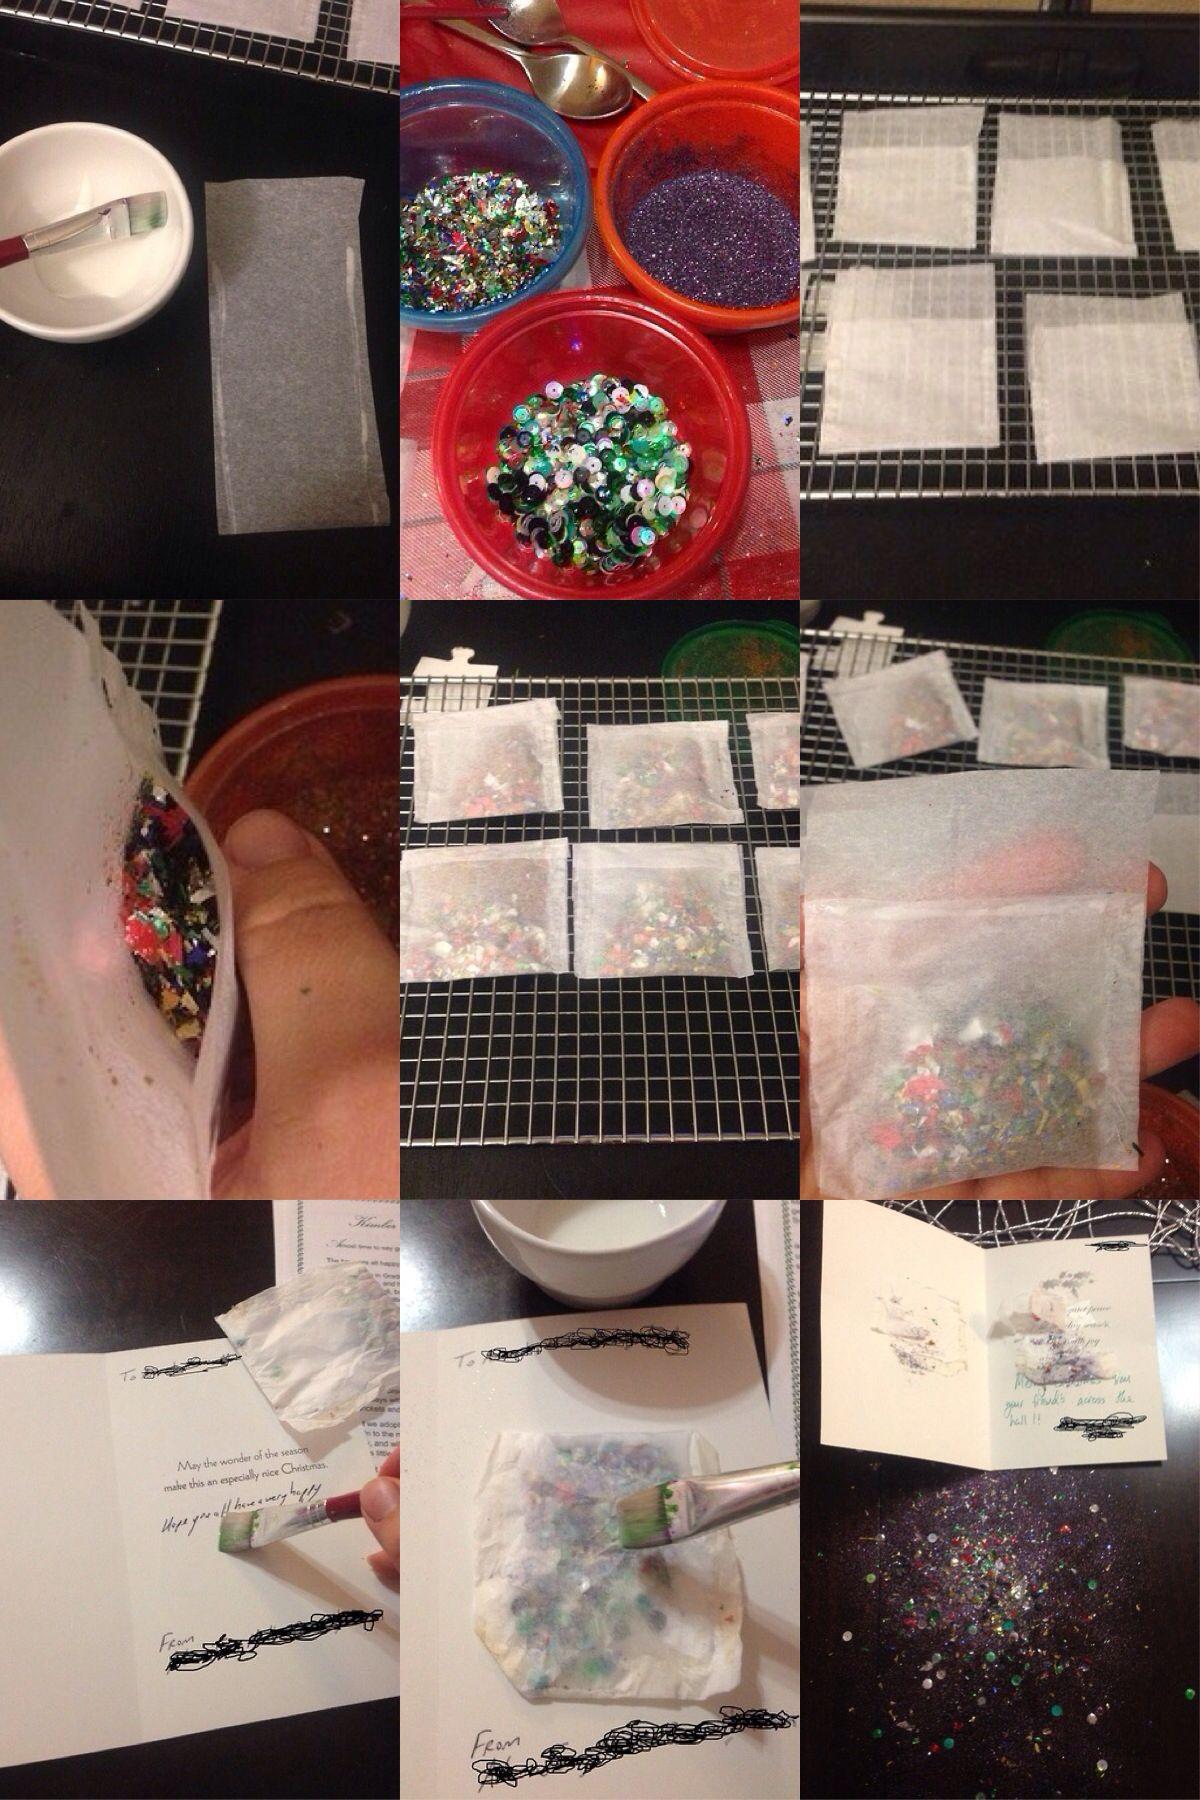 how to make glitter bombs